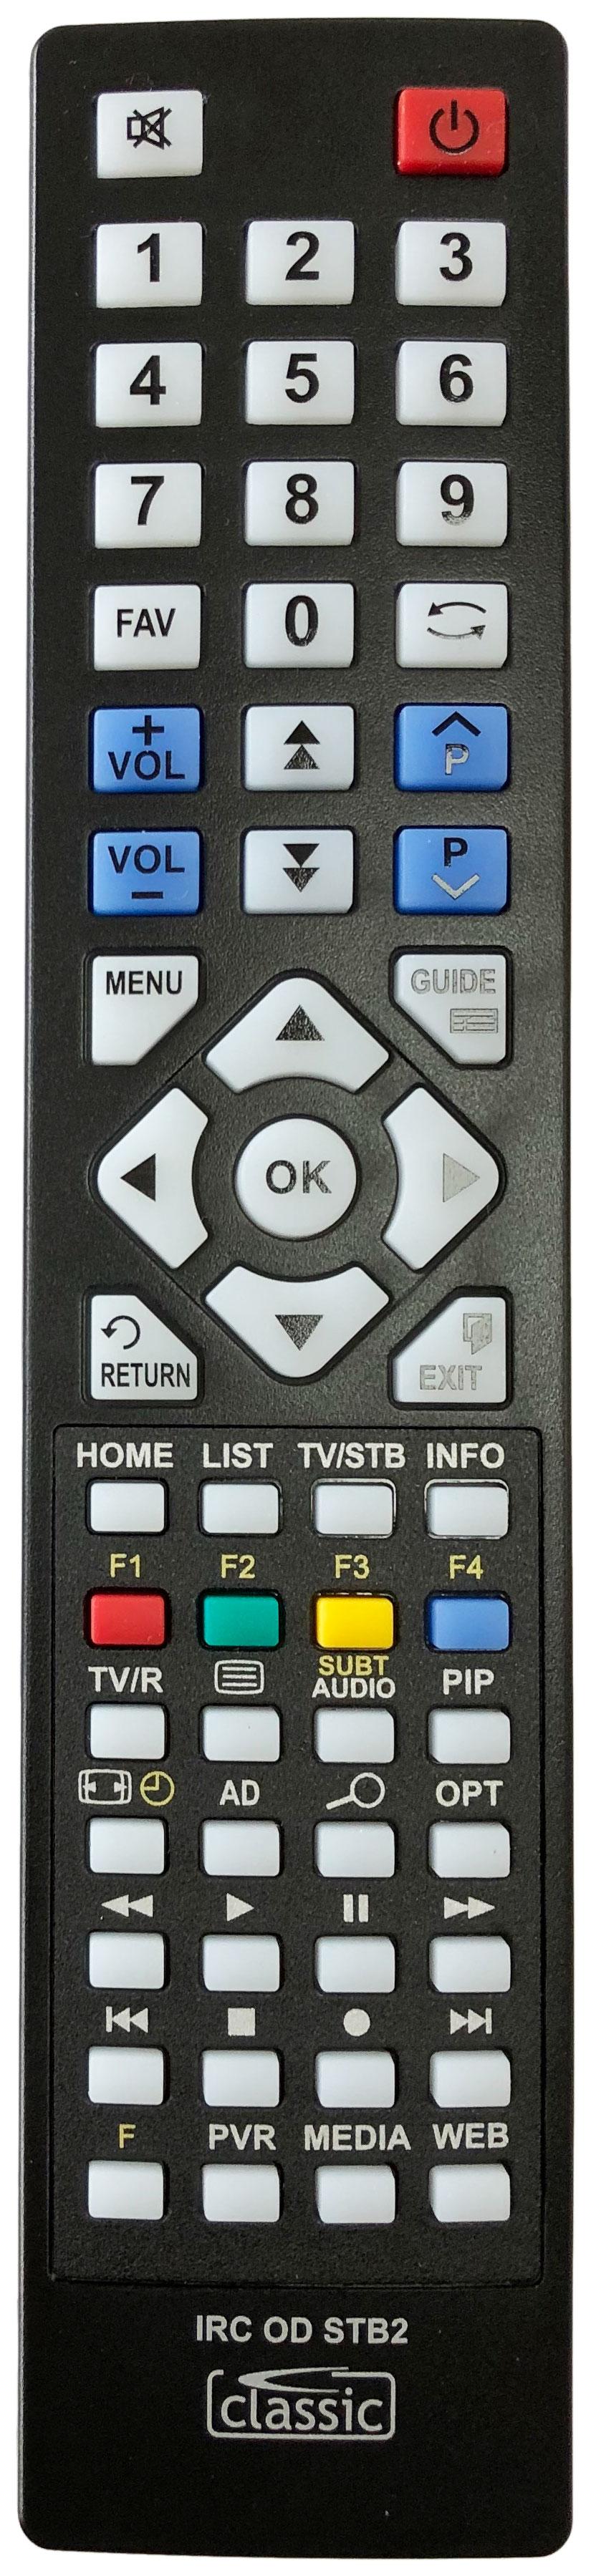 SAGEMCOM RTI95-320 T2 HD UK Remote Control